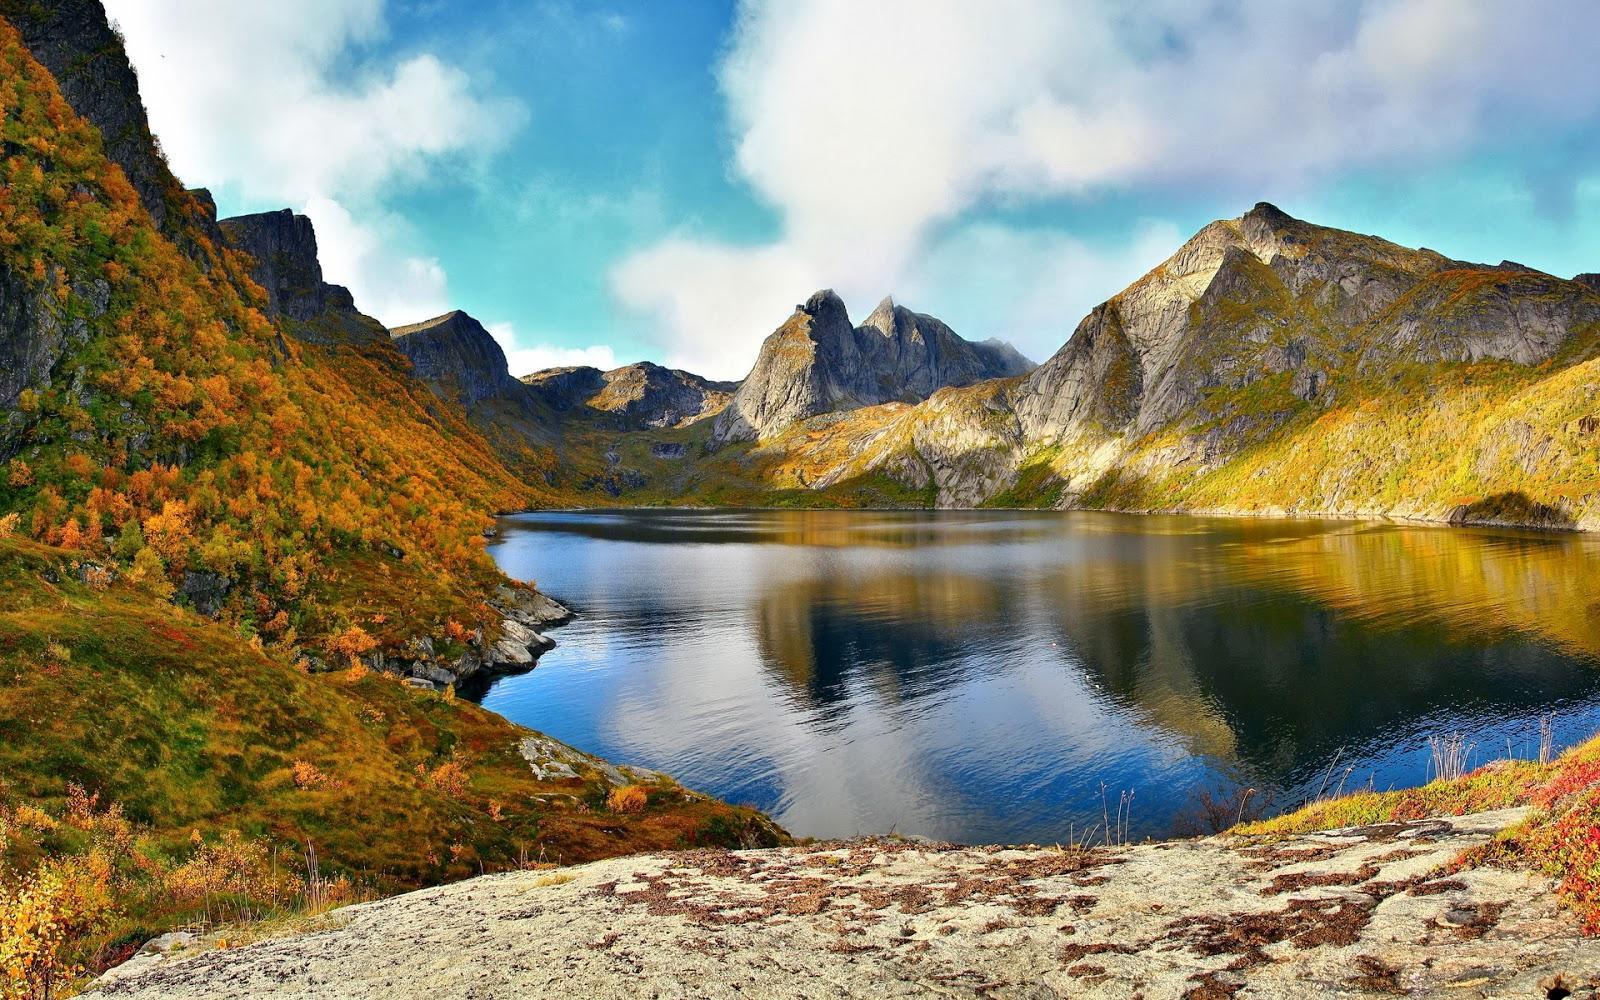 Gambar Pemandangan Gunung Gambar Pemandangan Pinterest20 Place Of